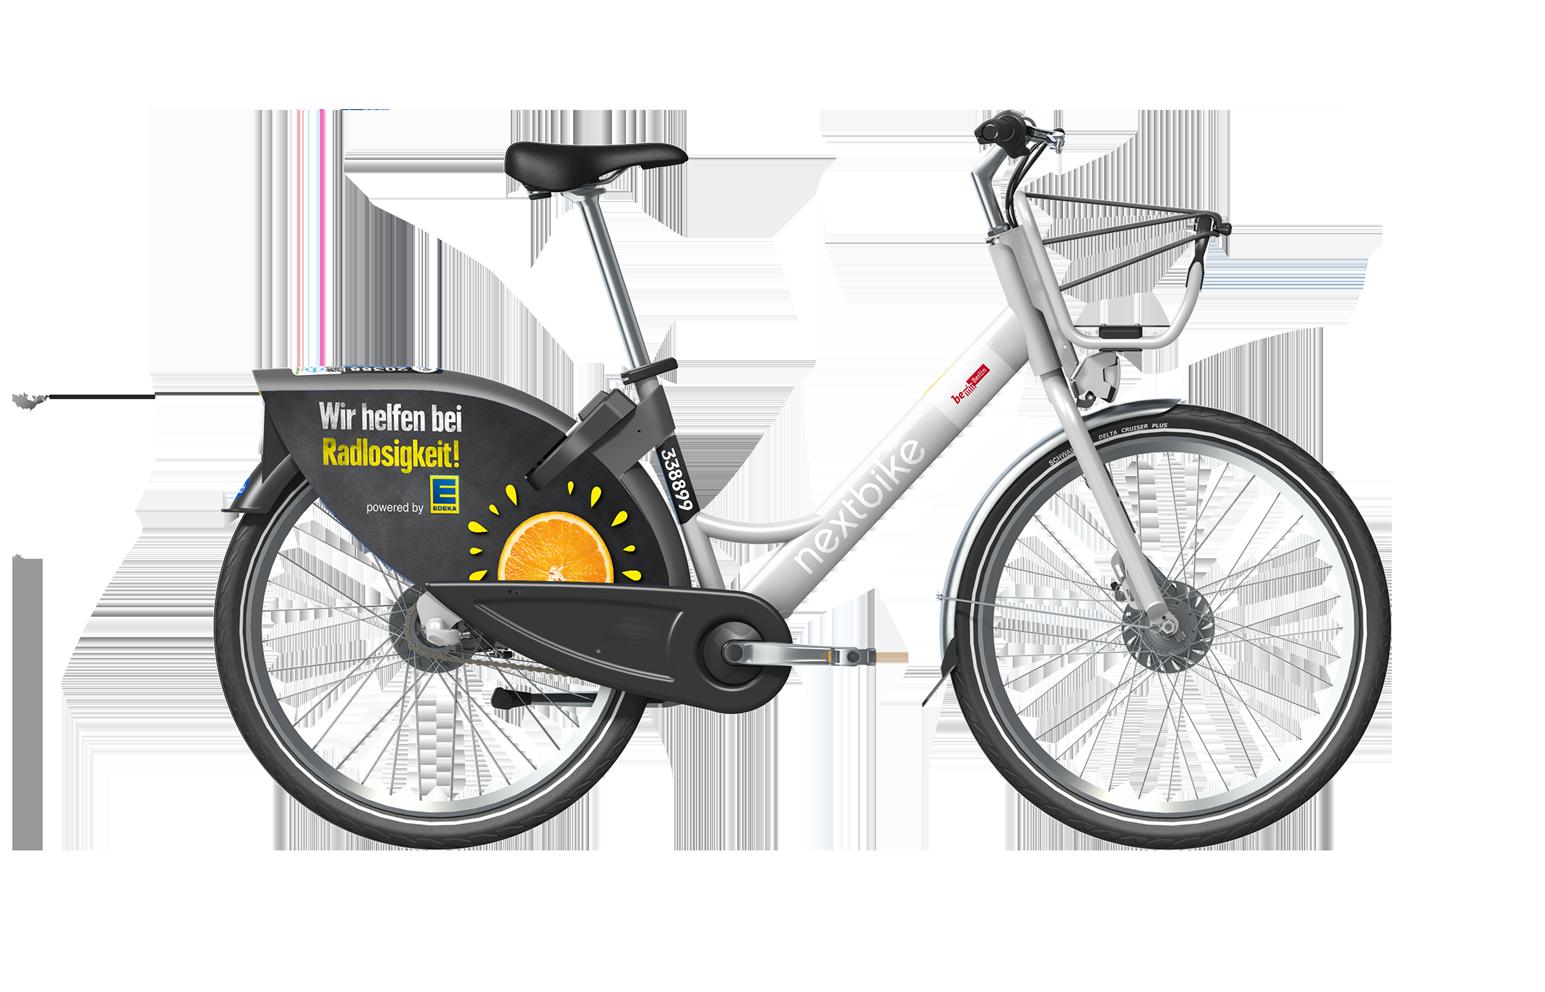 nextbike smartbike 2.0 mit edek branding